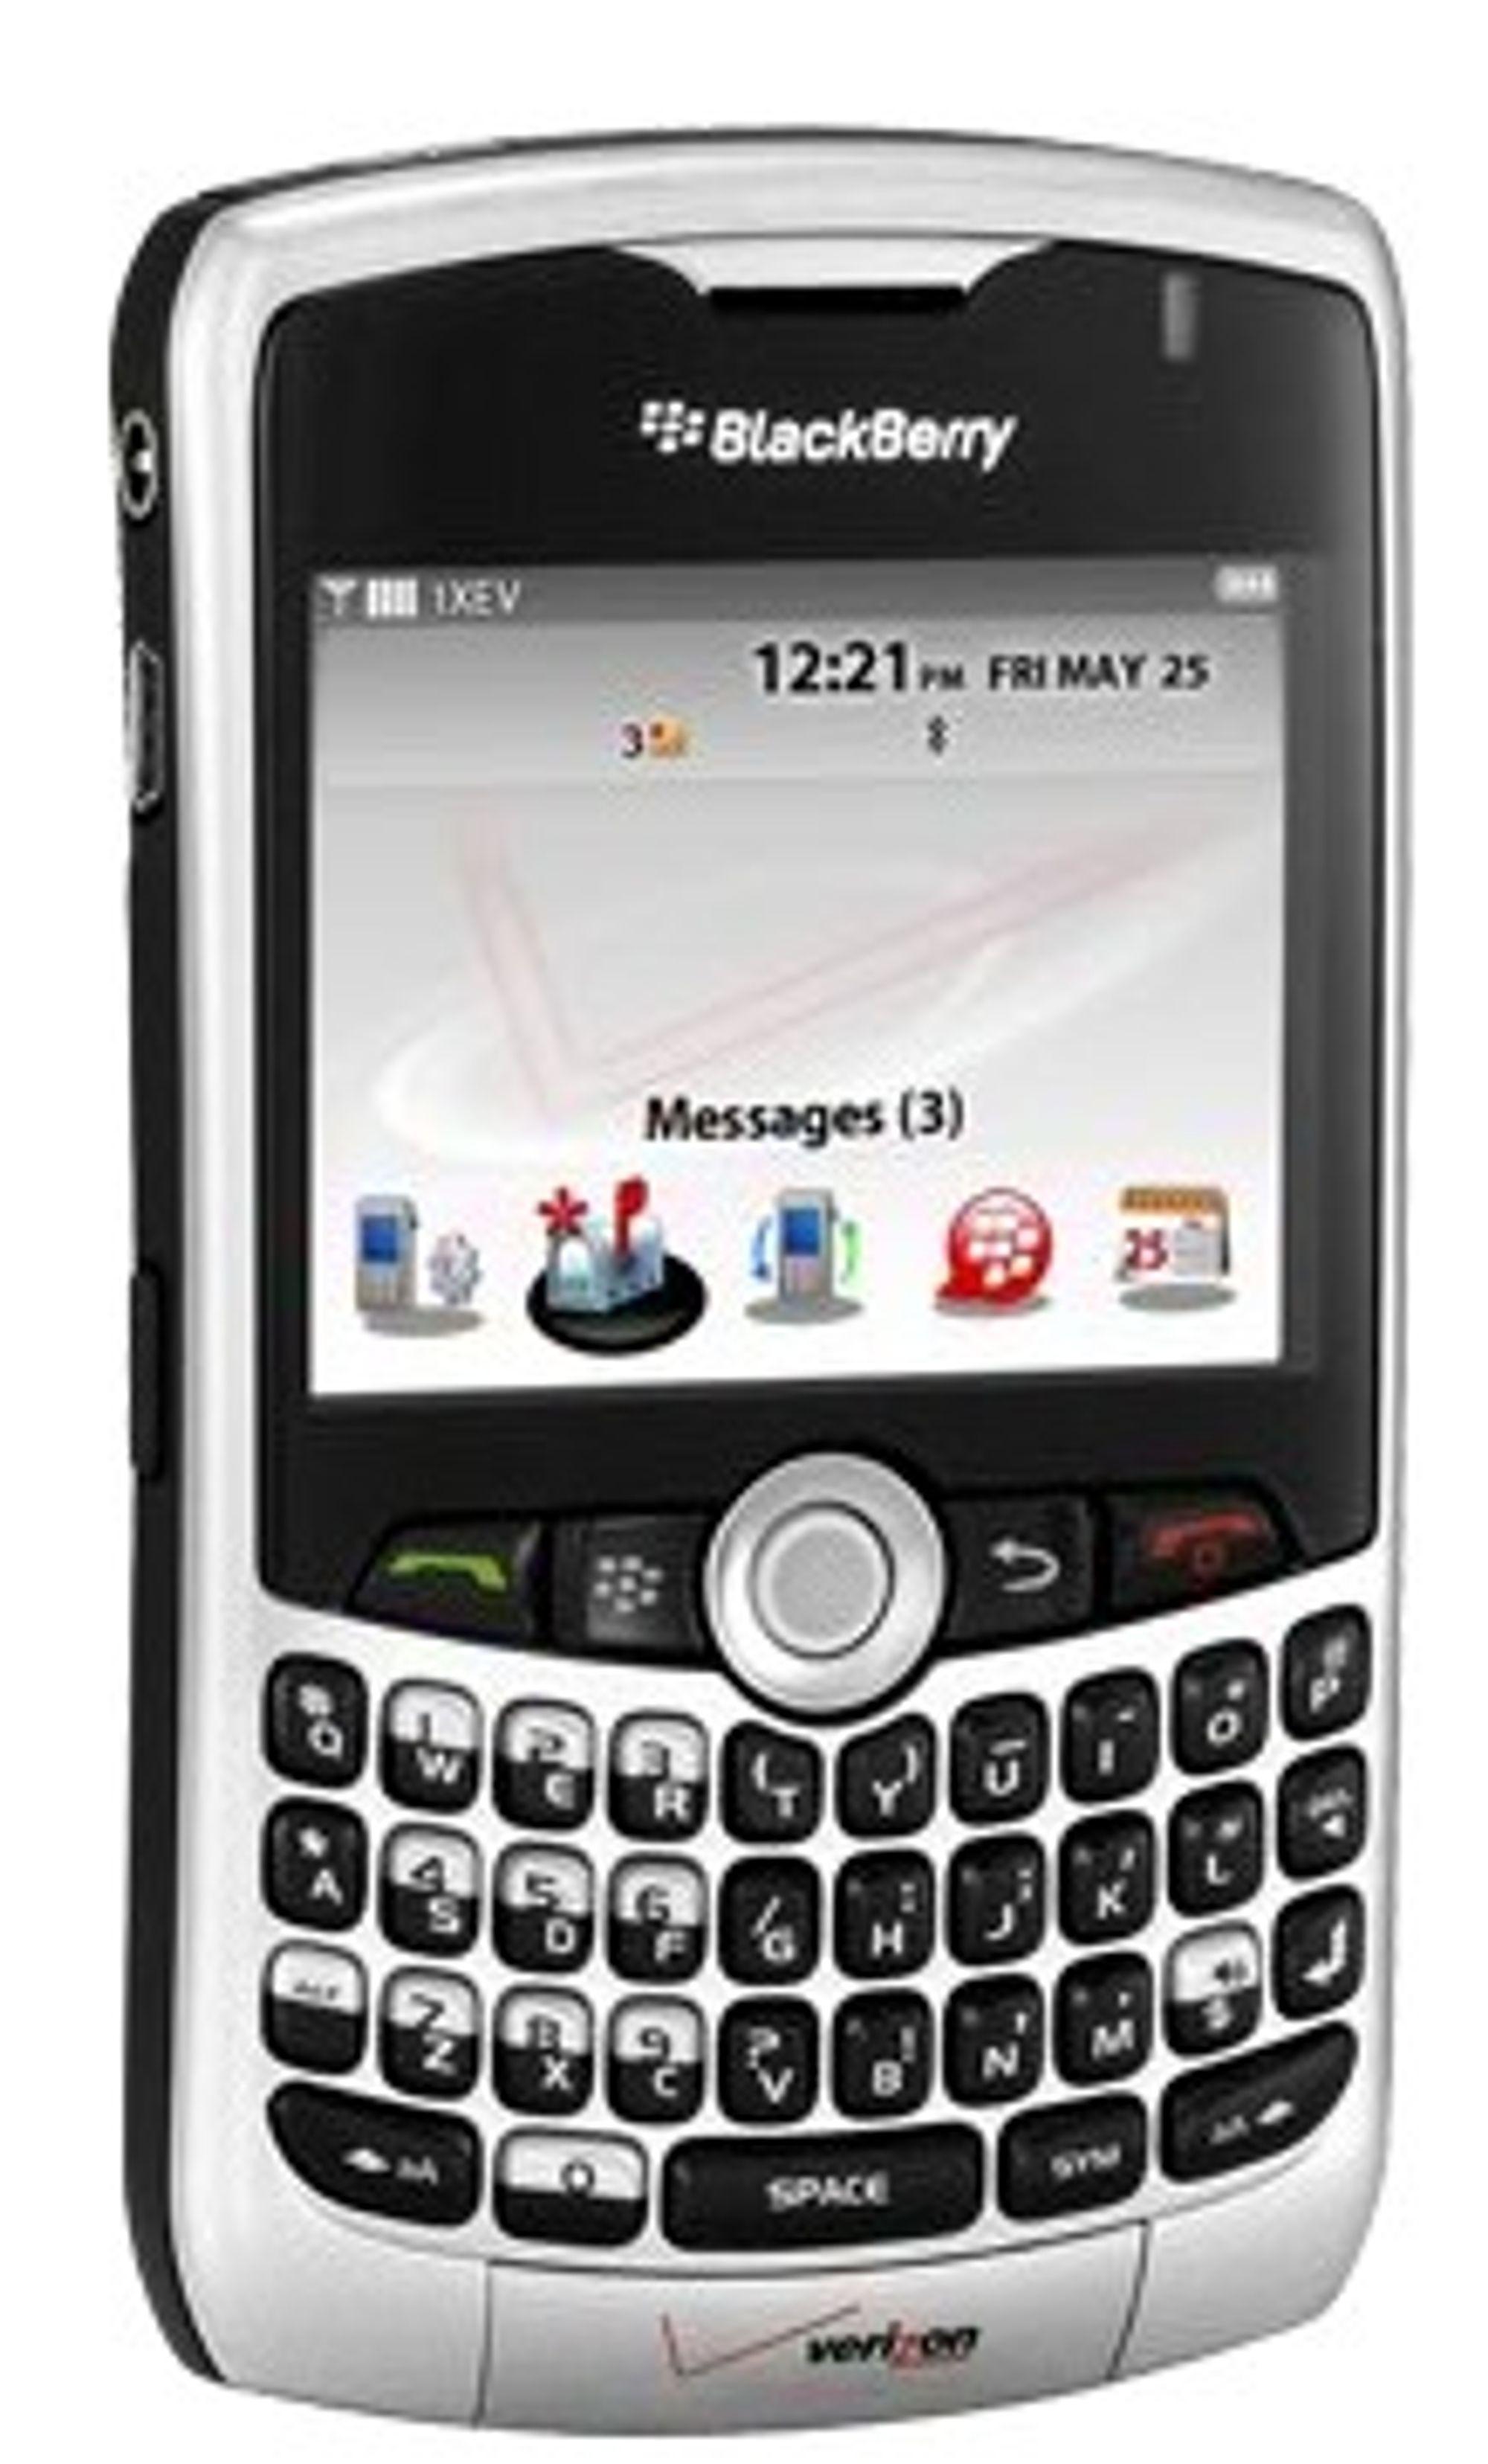 RIM Blackberry Curve